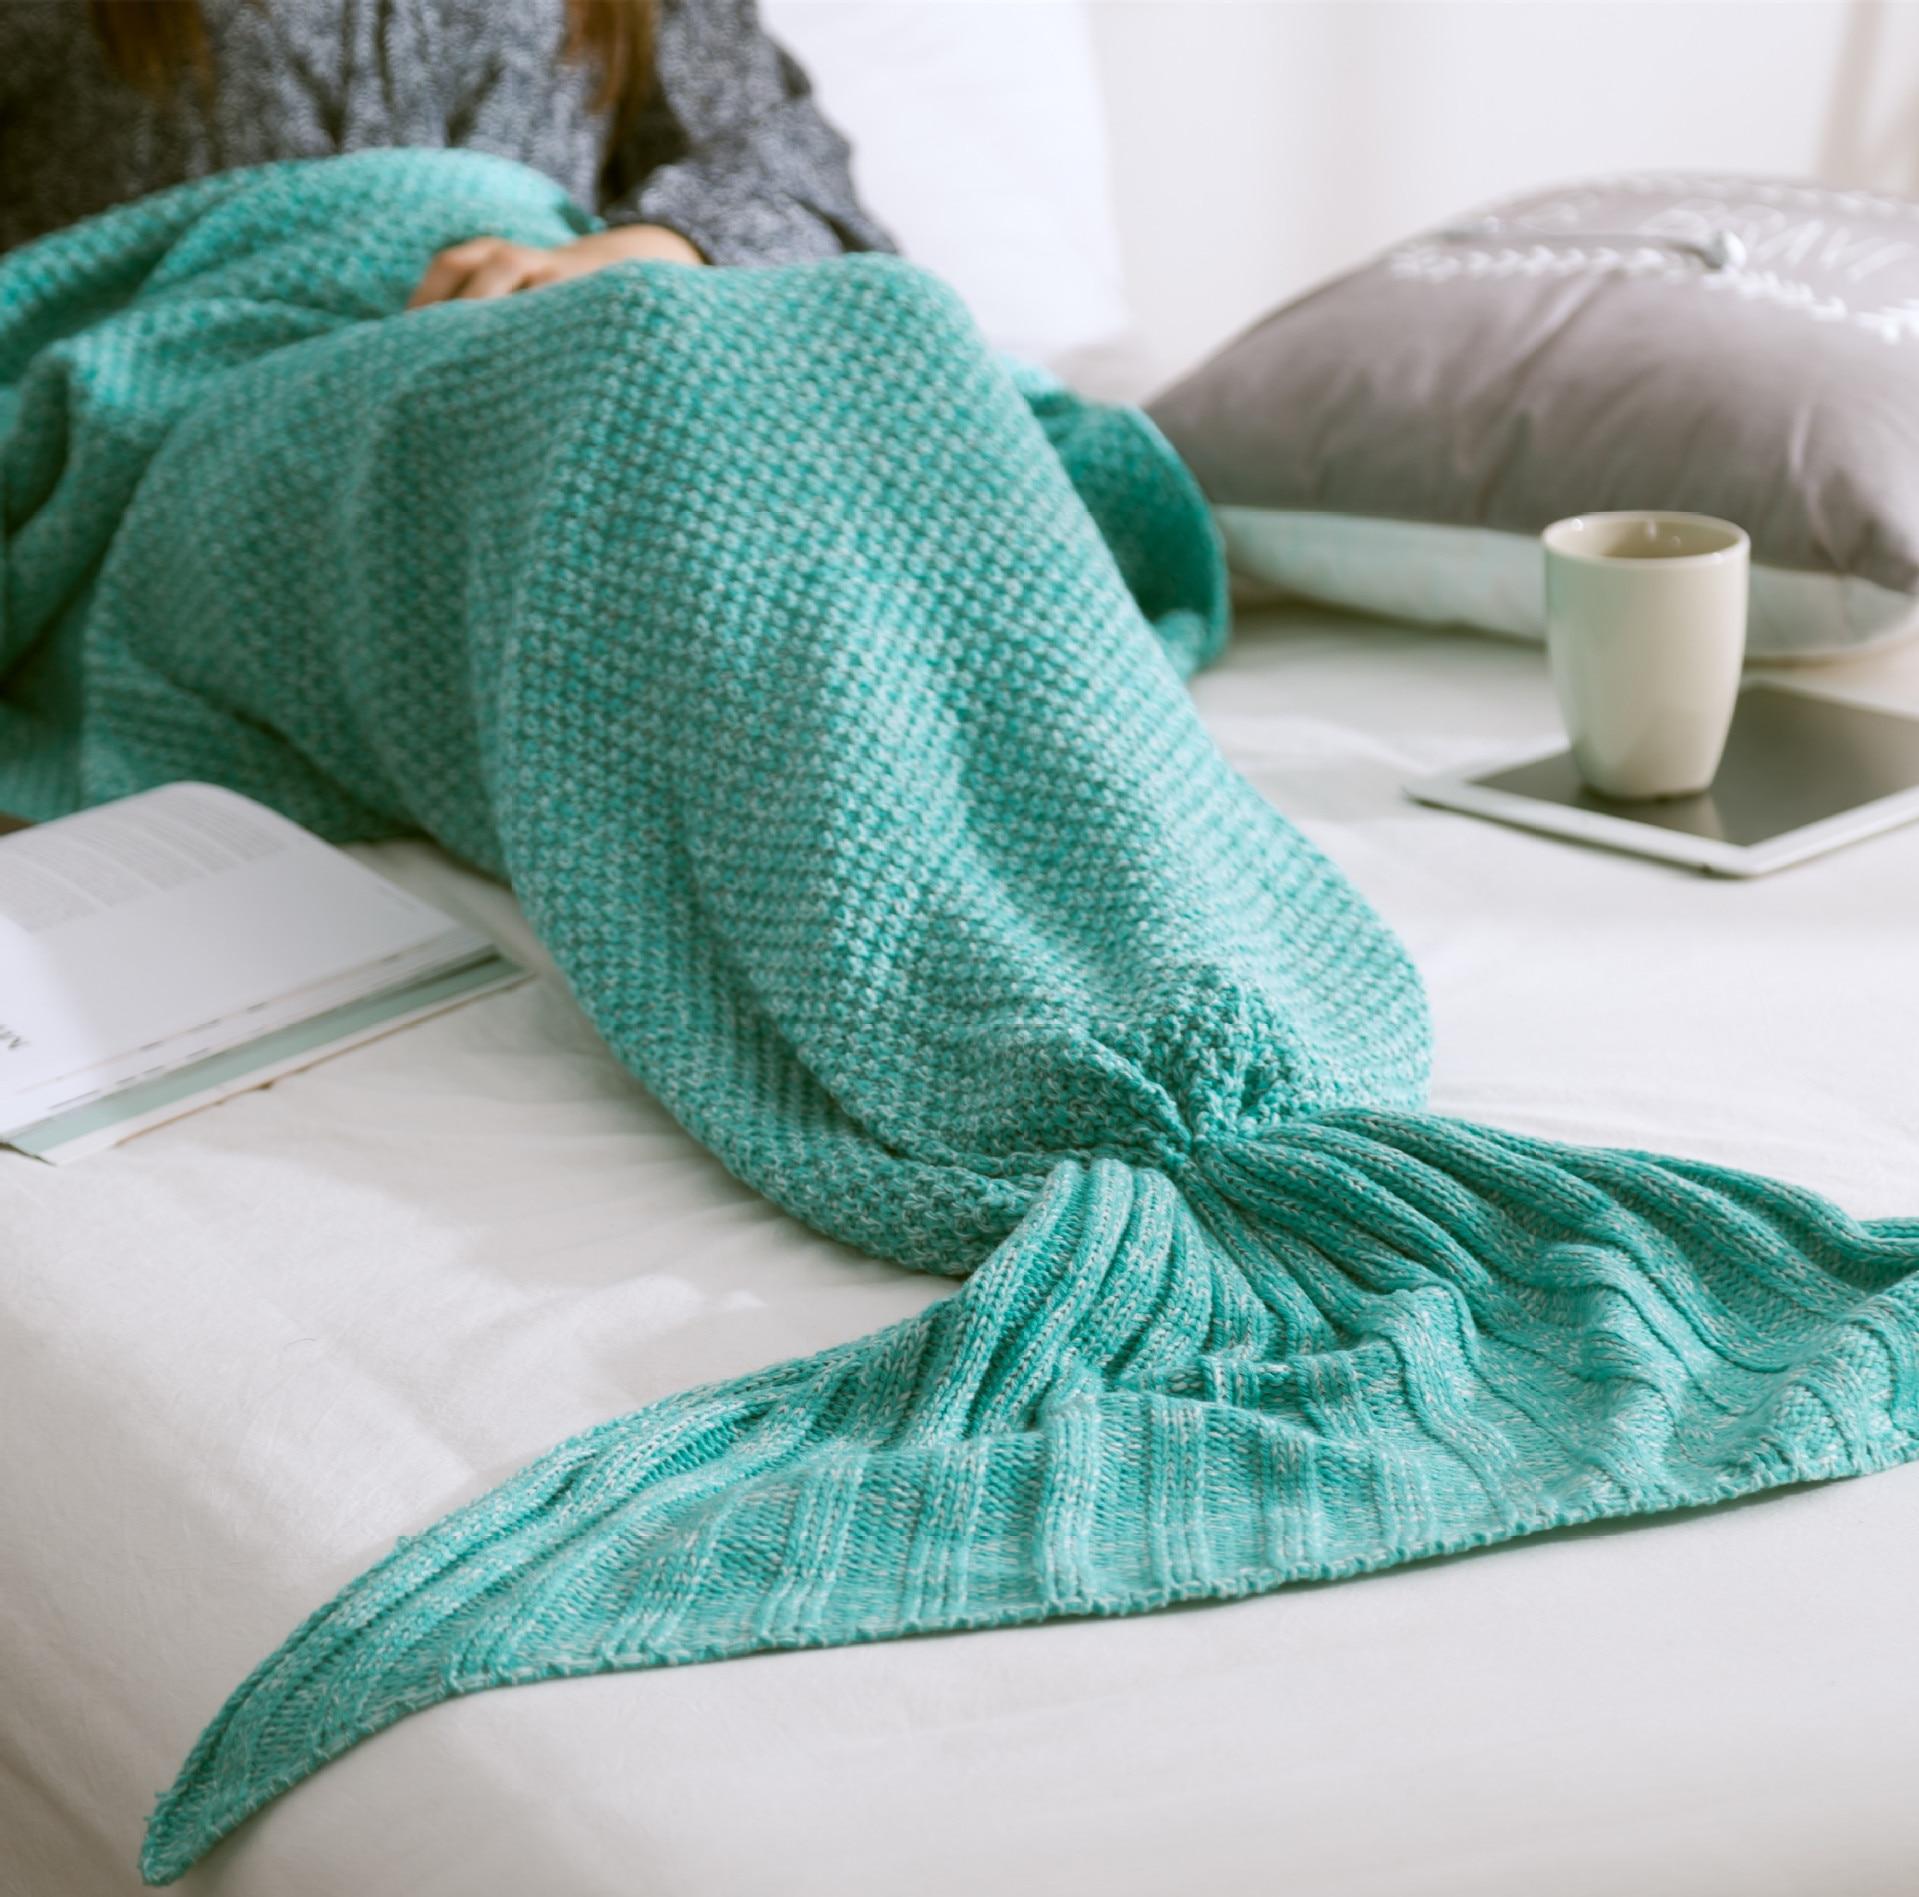 Super Soft Sleeping Bag Mermaid Throw Blanket Knitted Fish Tail ...